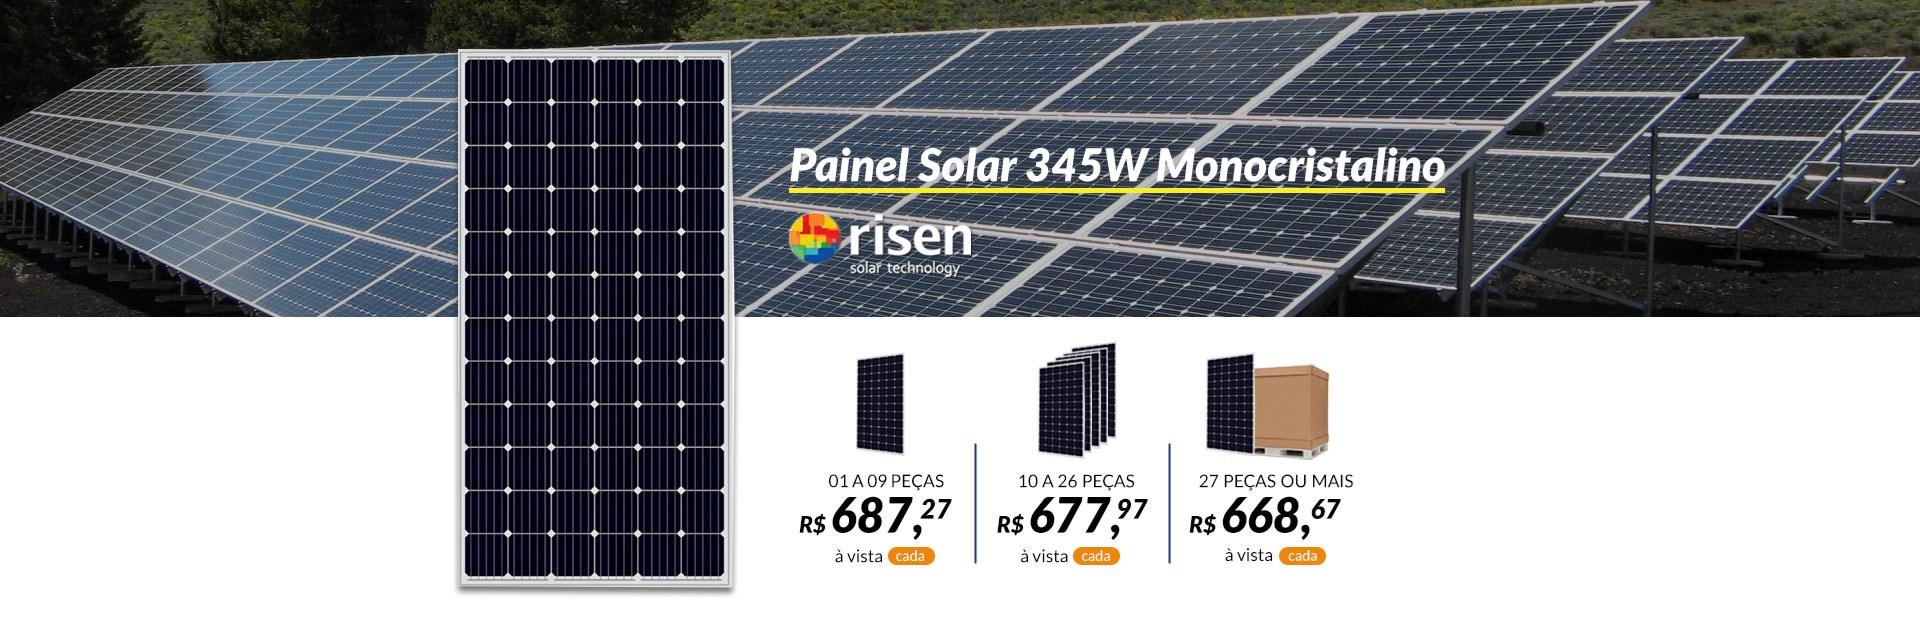 Painel Solar 345W Monocristalino - Risen Solar